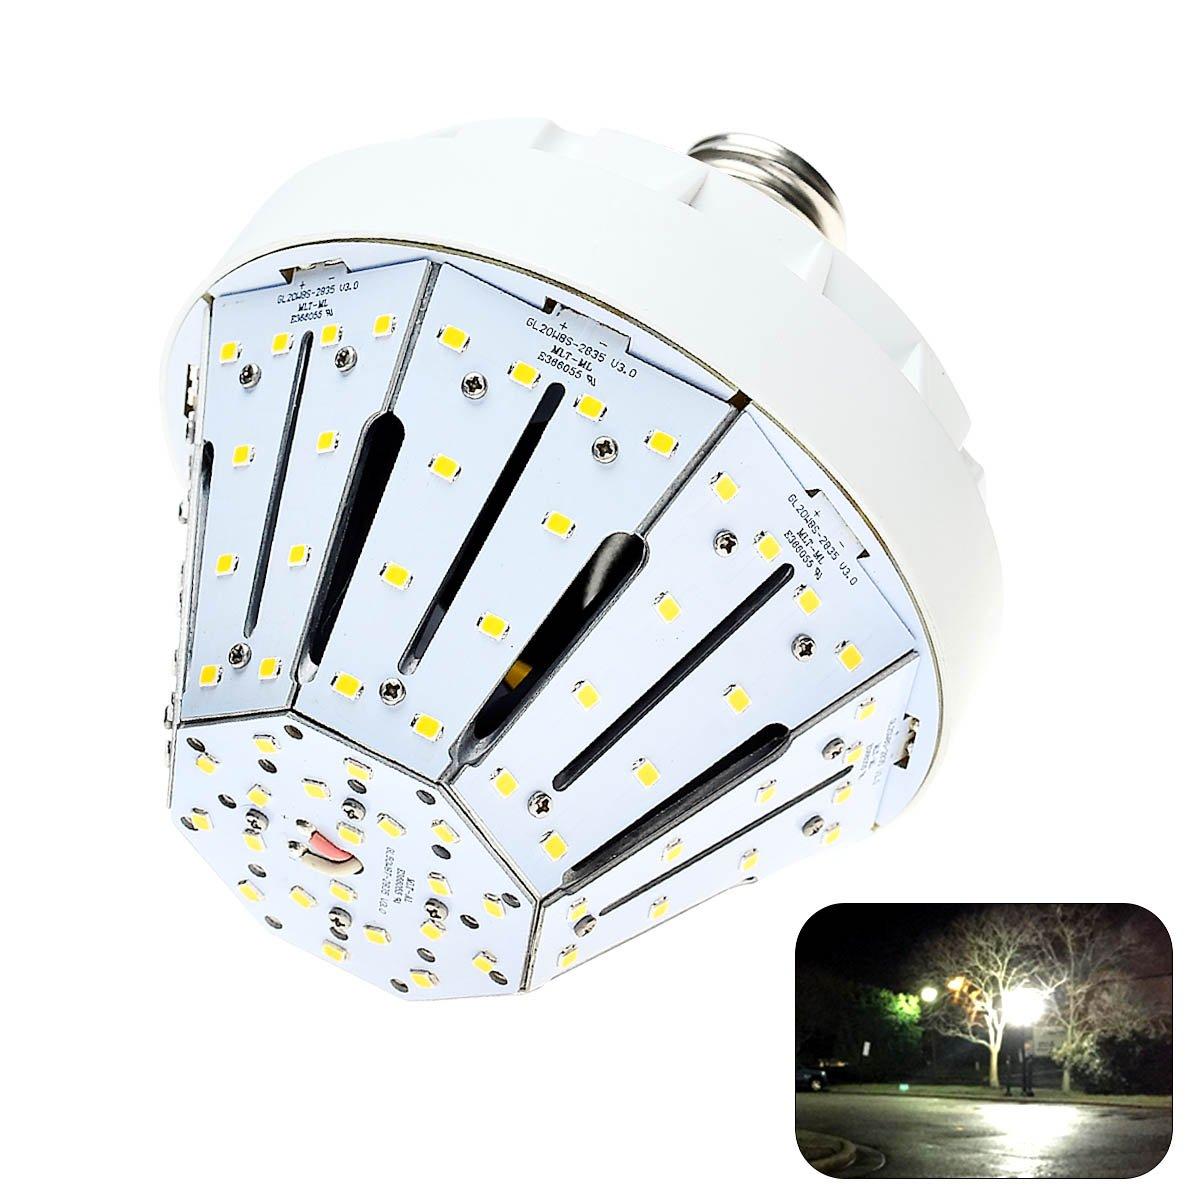 Phenas 20W LED Corn Light Bulbs E26 Base 3500 Lumens 4000K for Street Area Light, Parking Lot, Post Lighting, Gymnasium,Warehouse, Subway, Porch, Backyard, Garden Super Bright